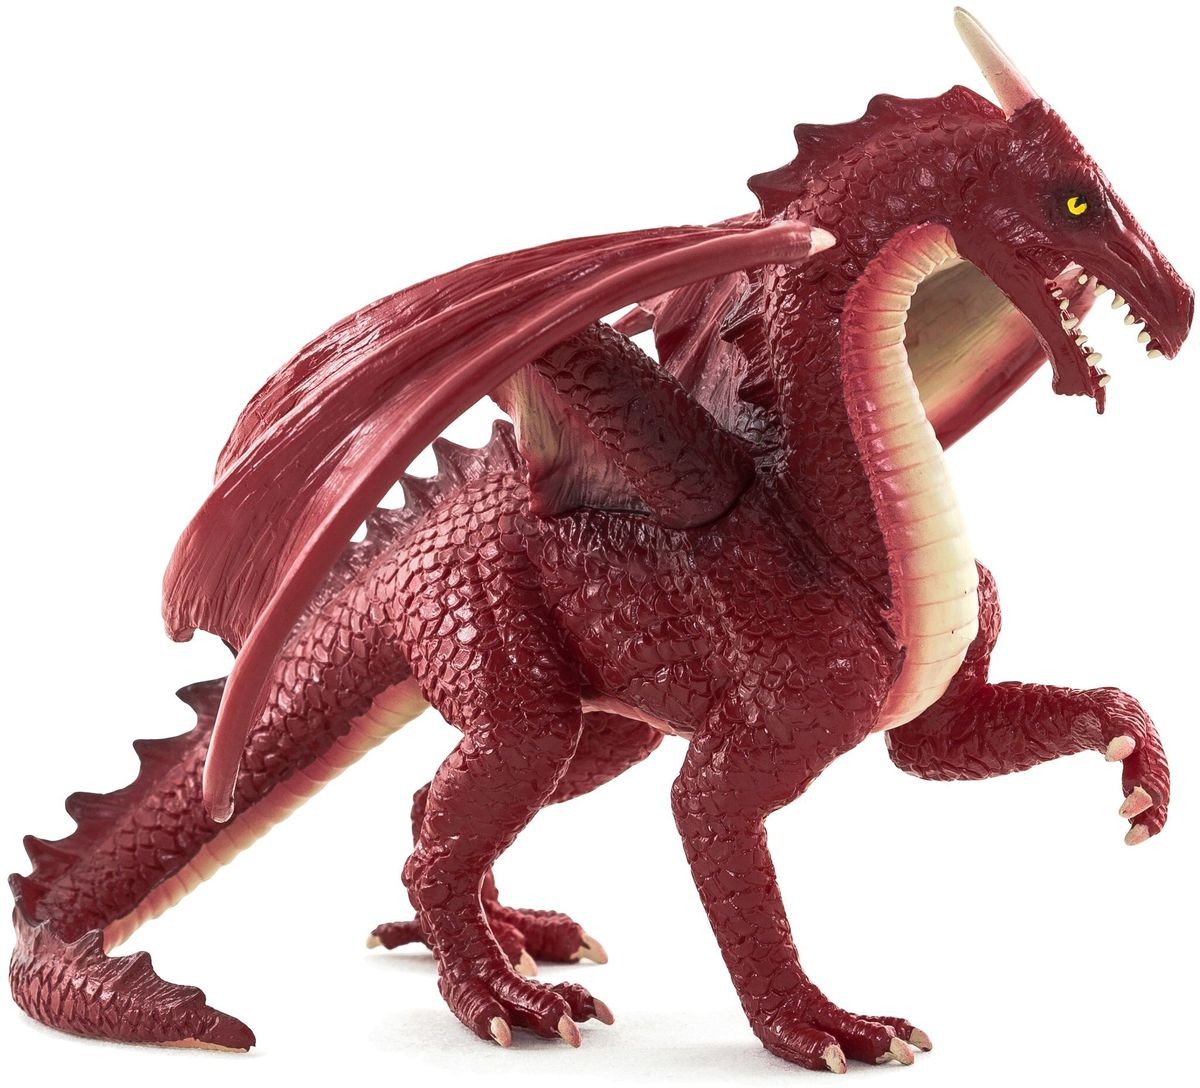 Mojo Фигурка Дракон Deluxe цвет красный - Фигурки